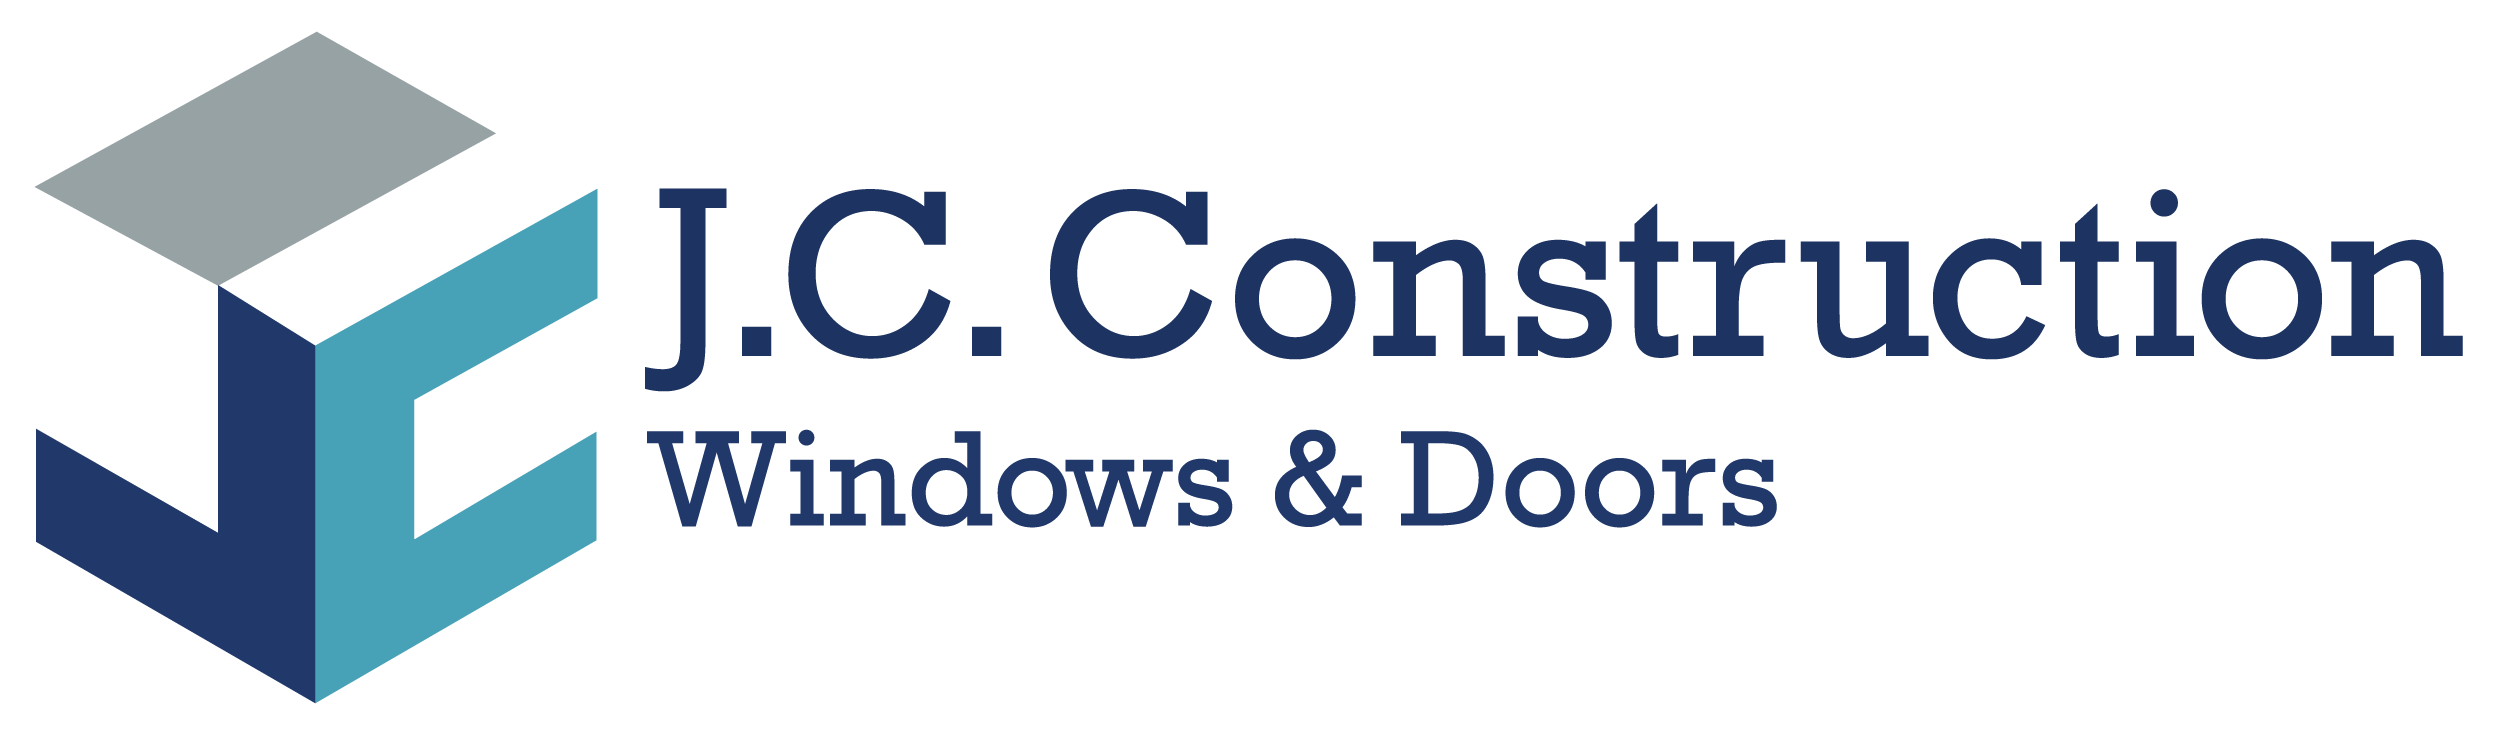 JC Construction Windows & Doors